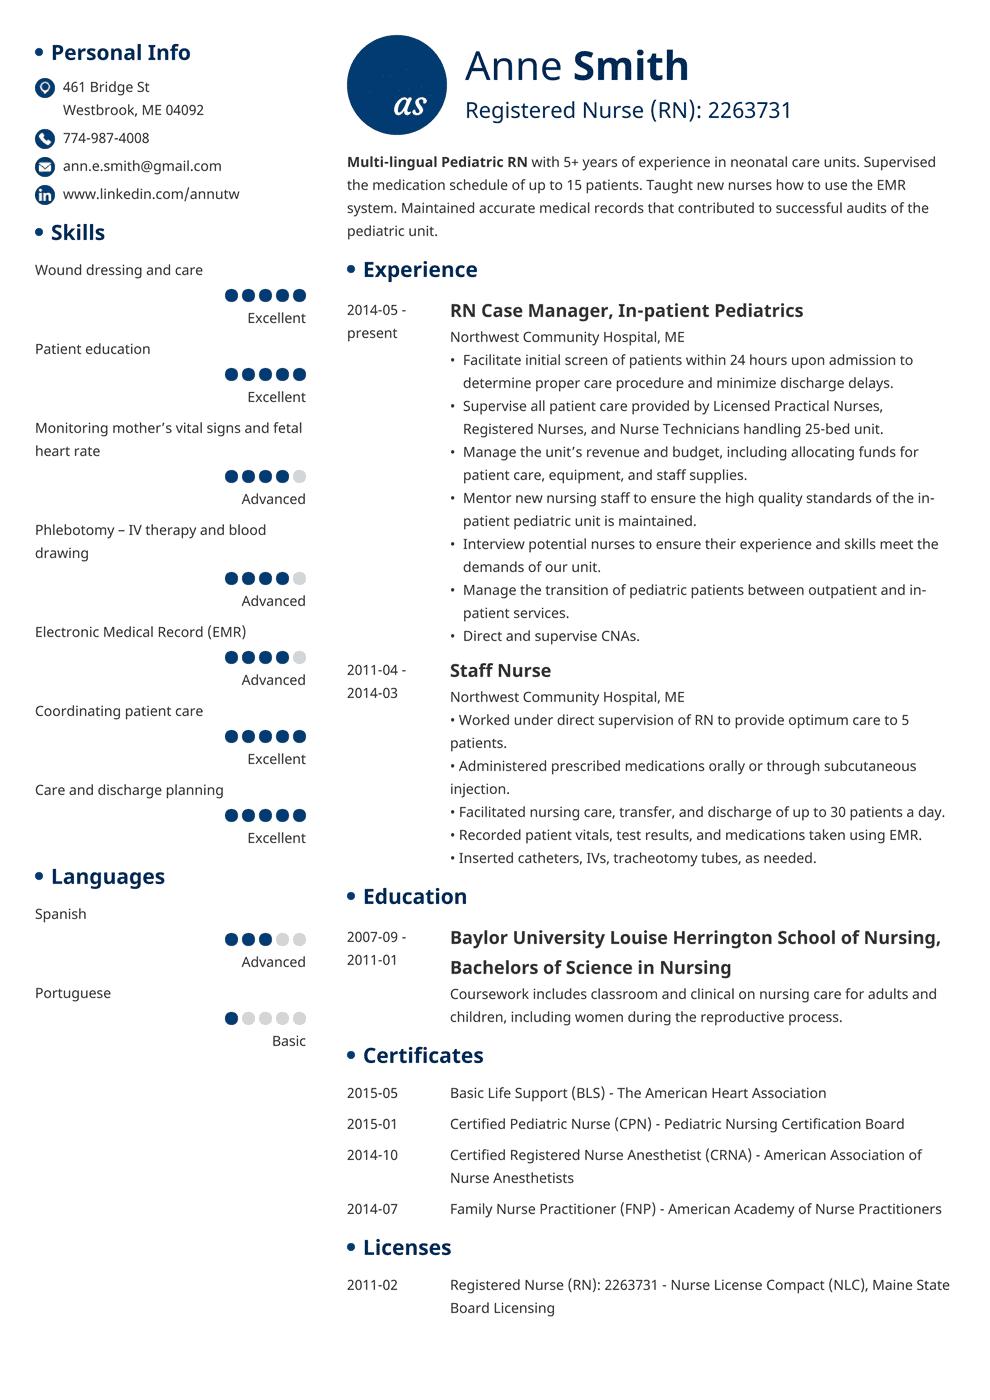 nursing resume template initials in 2020 Nursing resume